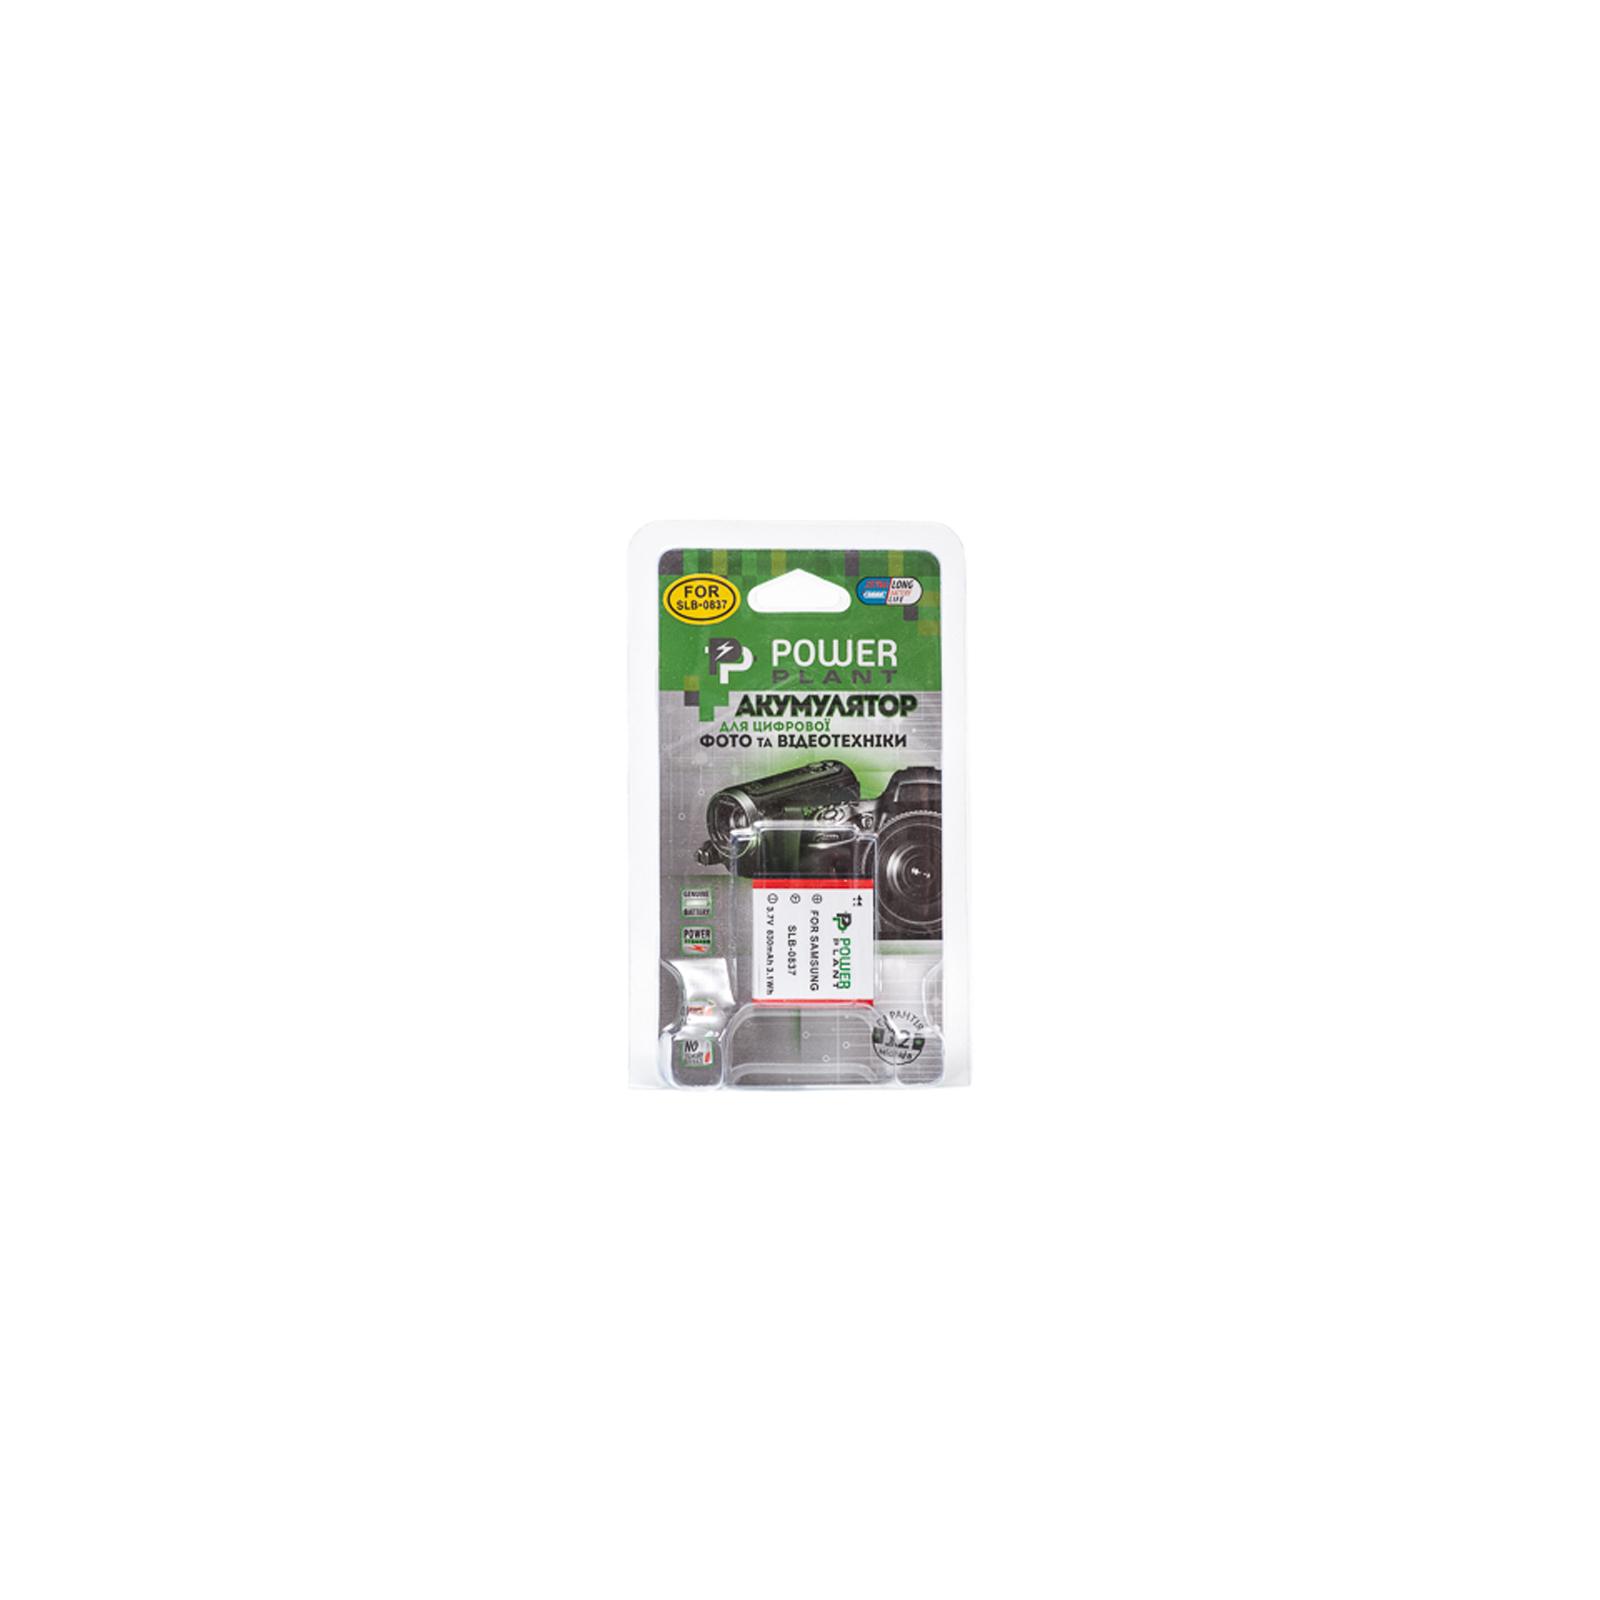 Аккумулятор к фото/видео PowerPlant Samsung SB-L0837 (DV00DV1202) изображение 3